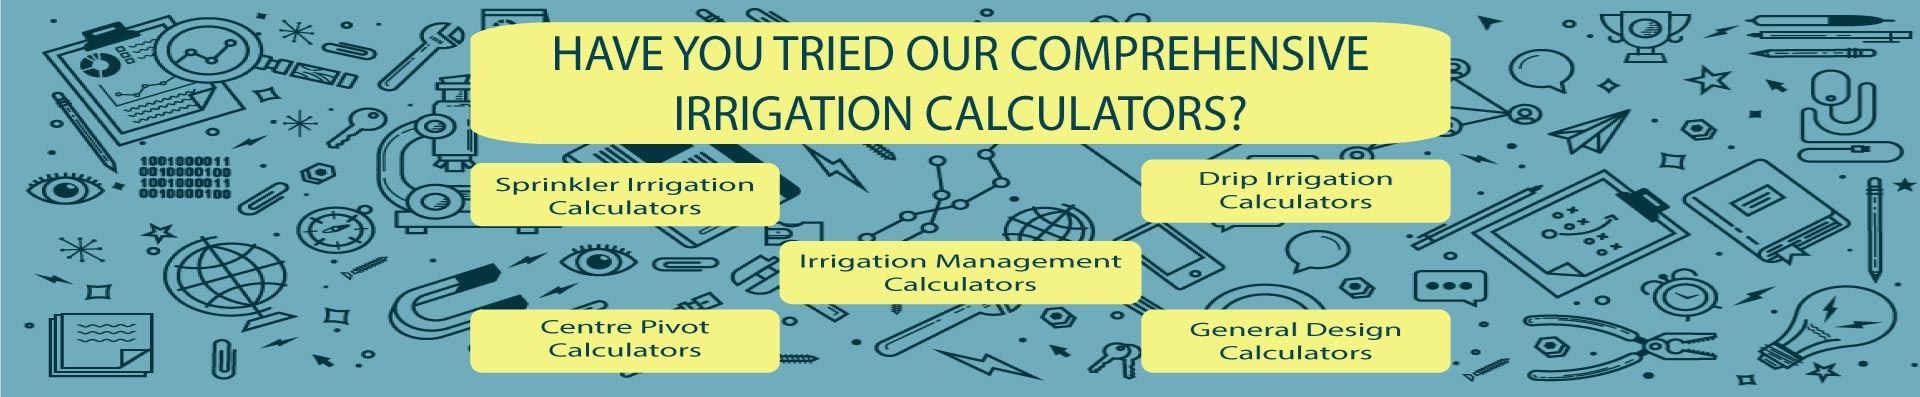 Comprehensive irrigation calculators